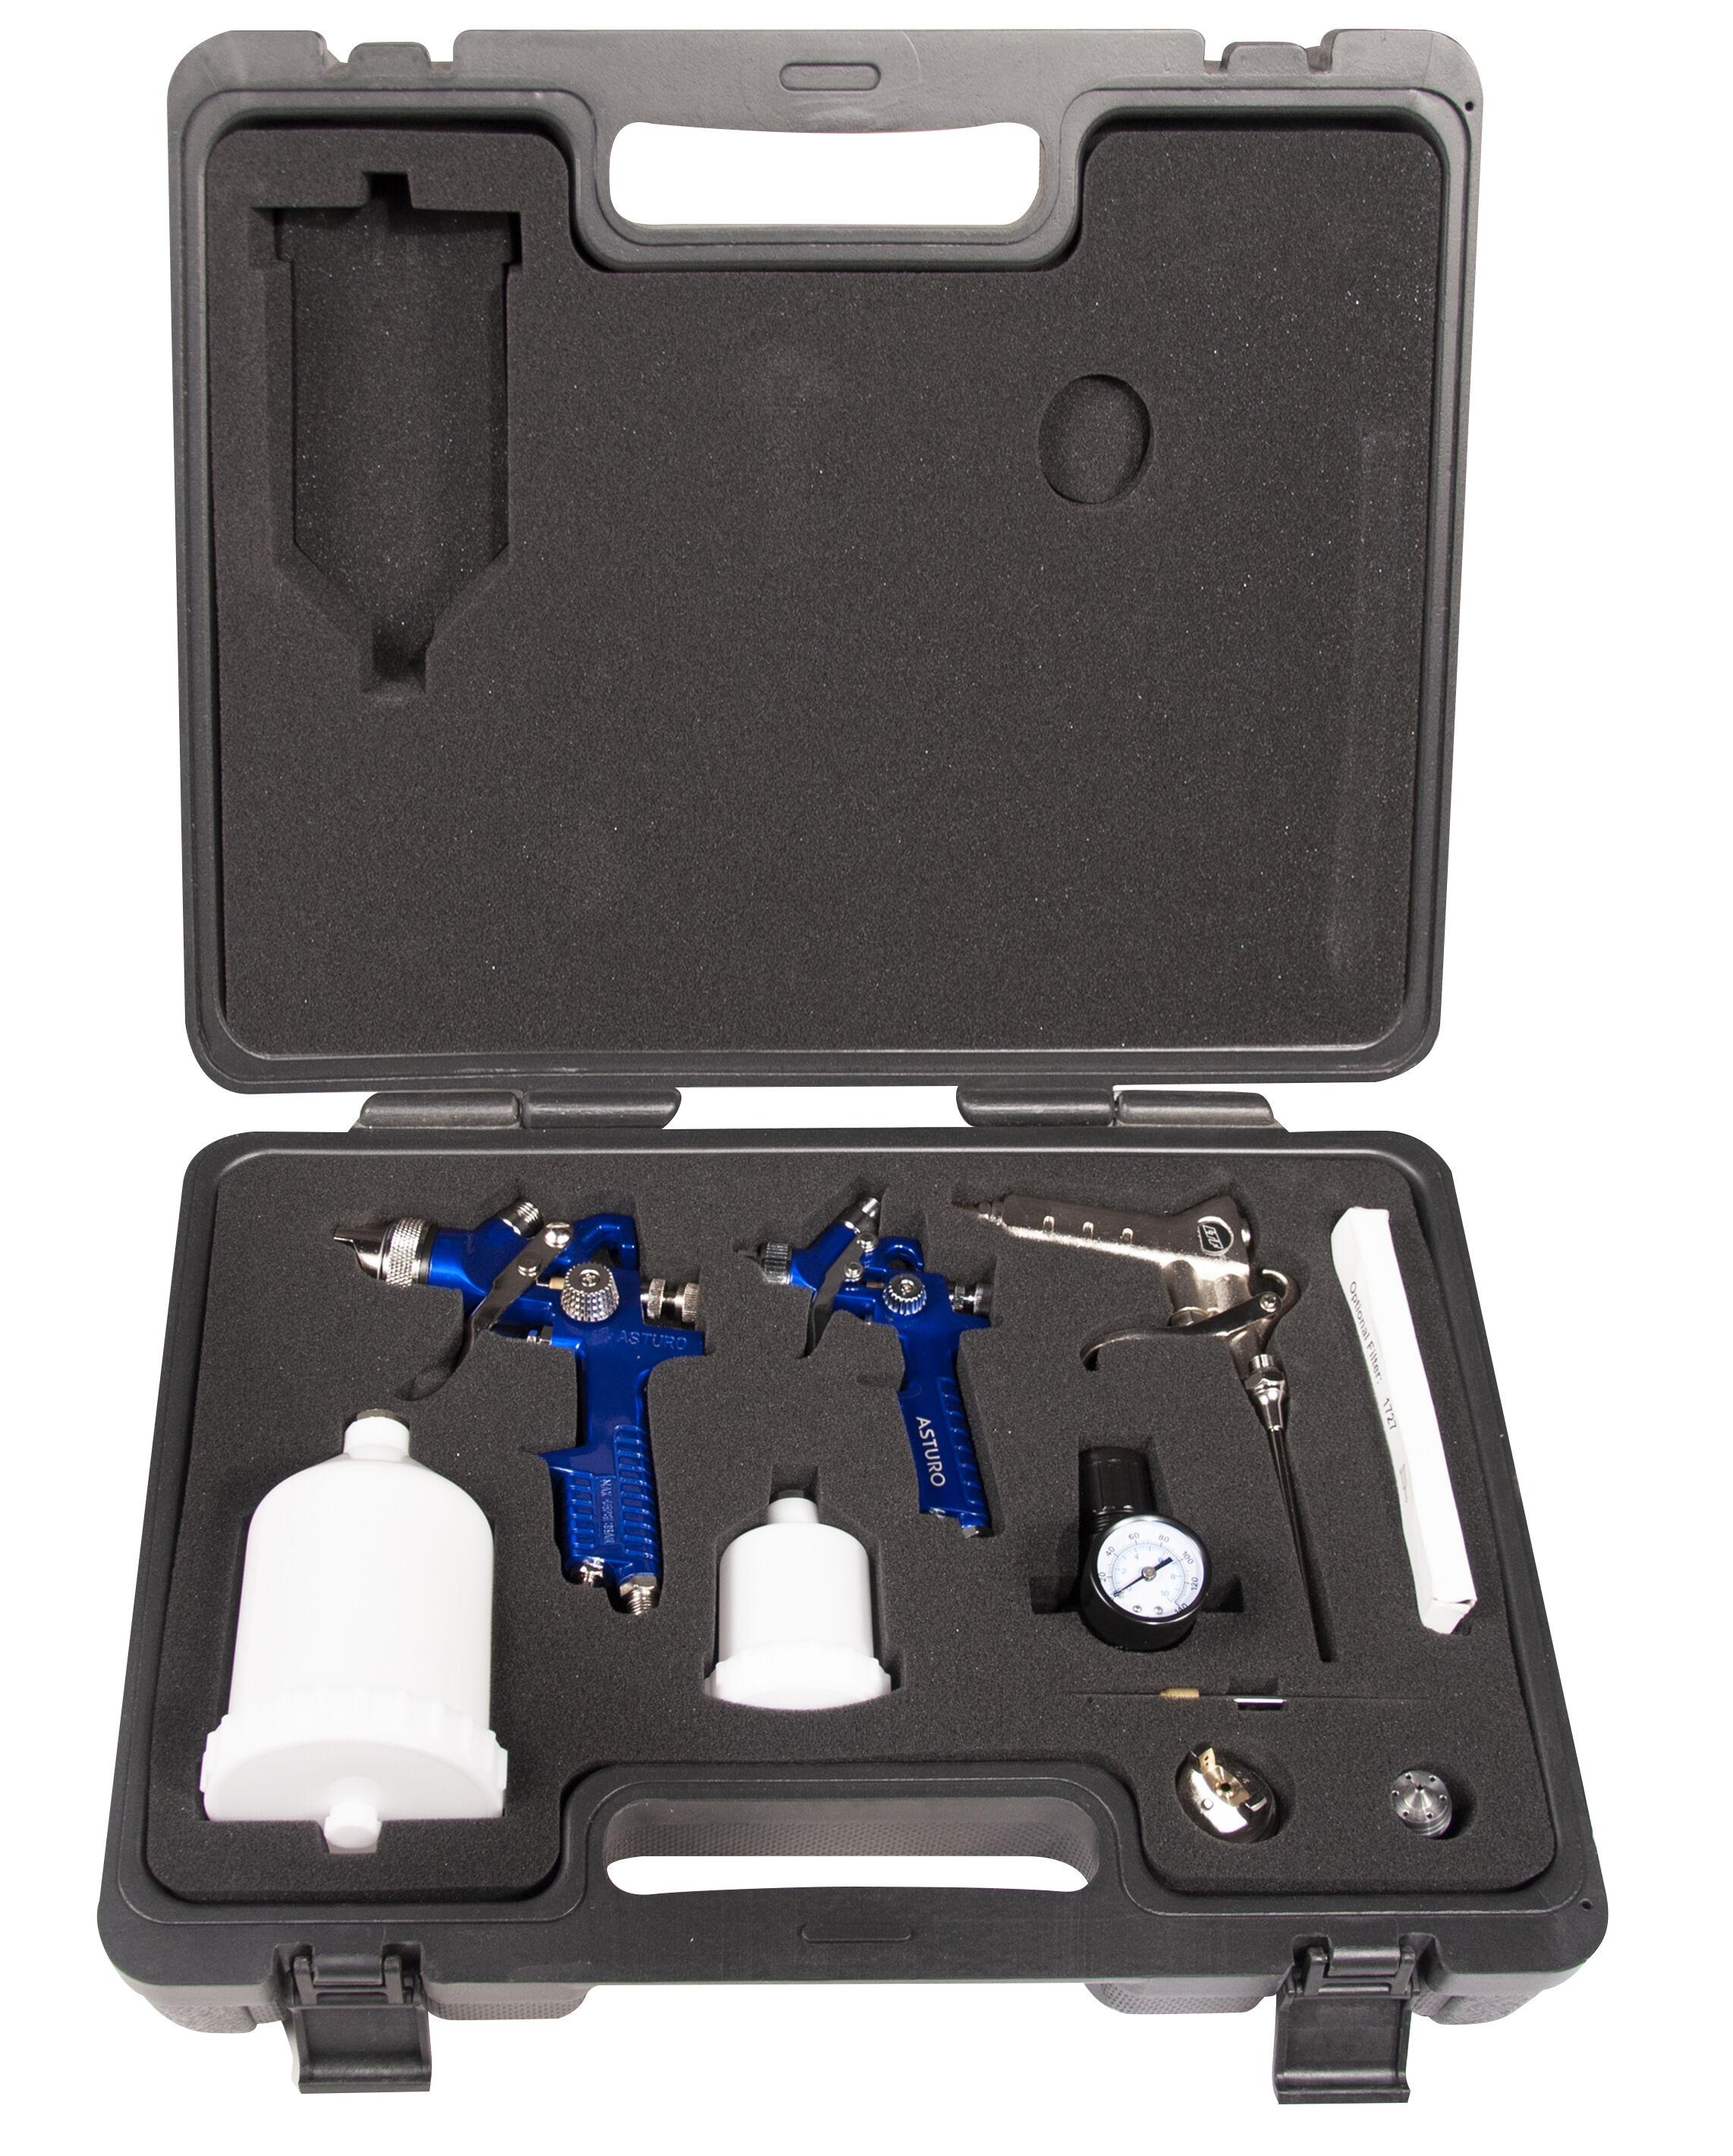 asturo kit aerografo manuale superiore a bassa pressione asturo h827 h2000 / kit 0090514k